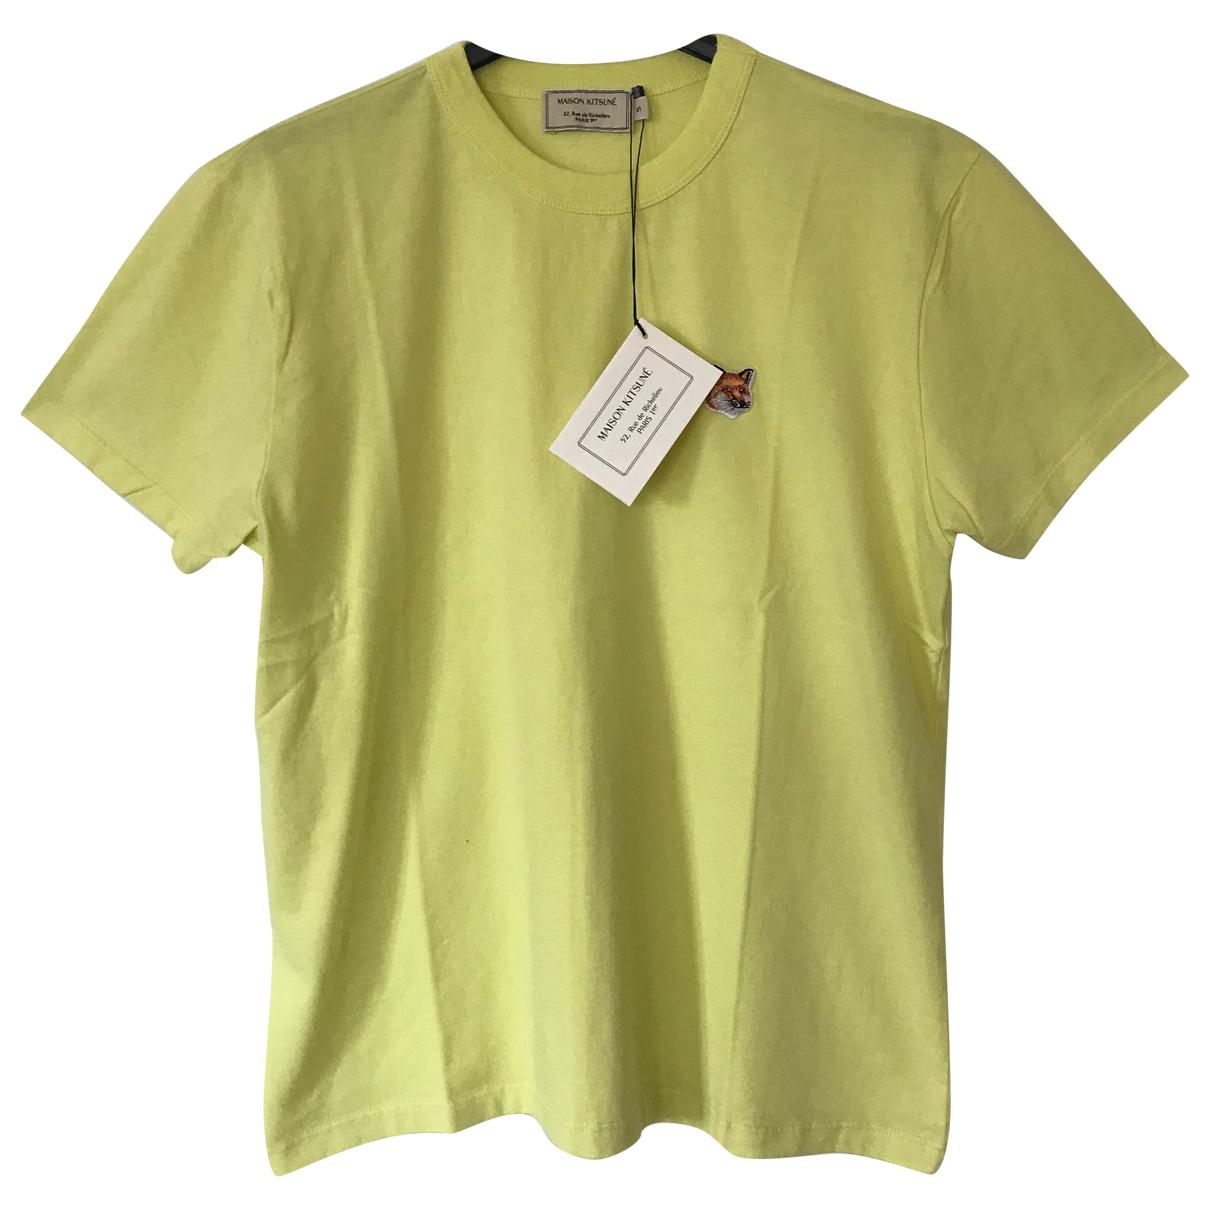 Maison Kitsune \N Yellow Cotton  top for Women S International